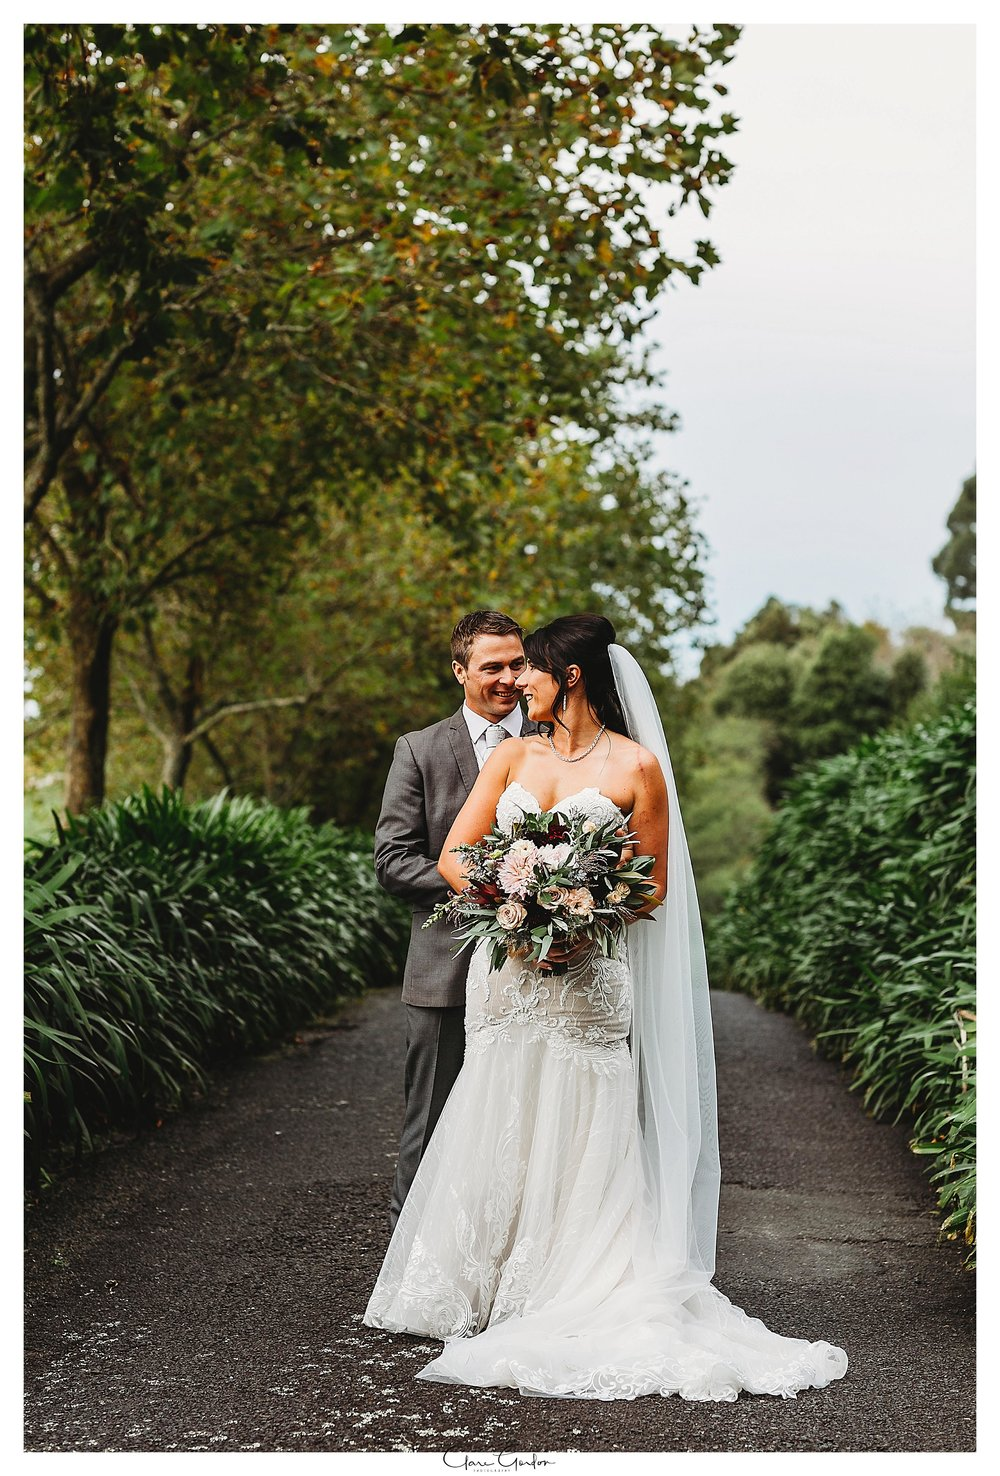 Eagle-ridge-wedding-photo-bride-and-groom-on-driveway-hugging